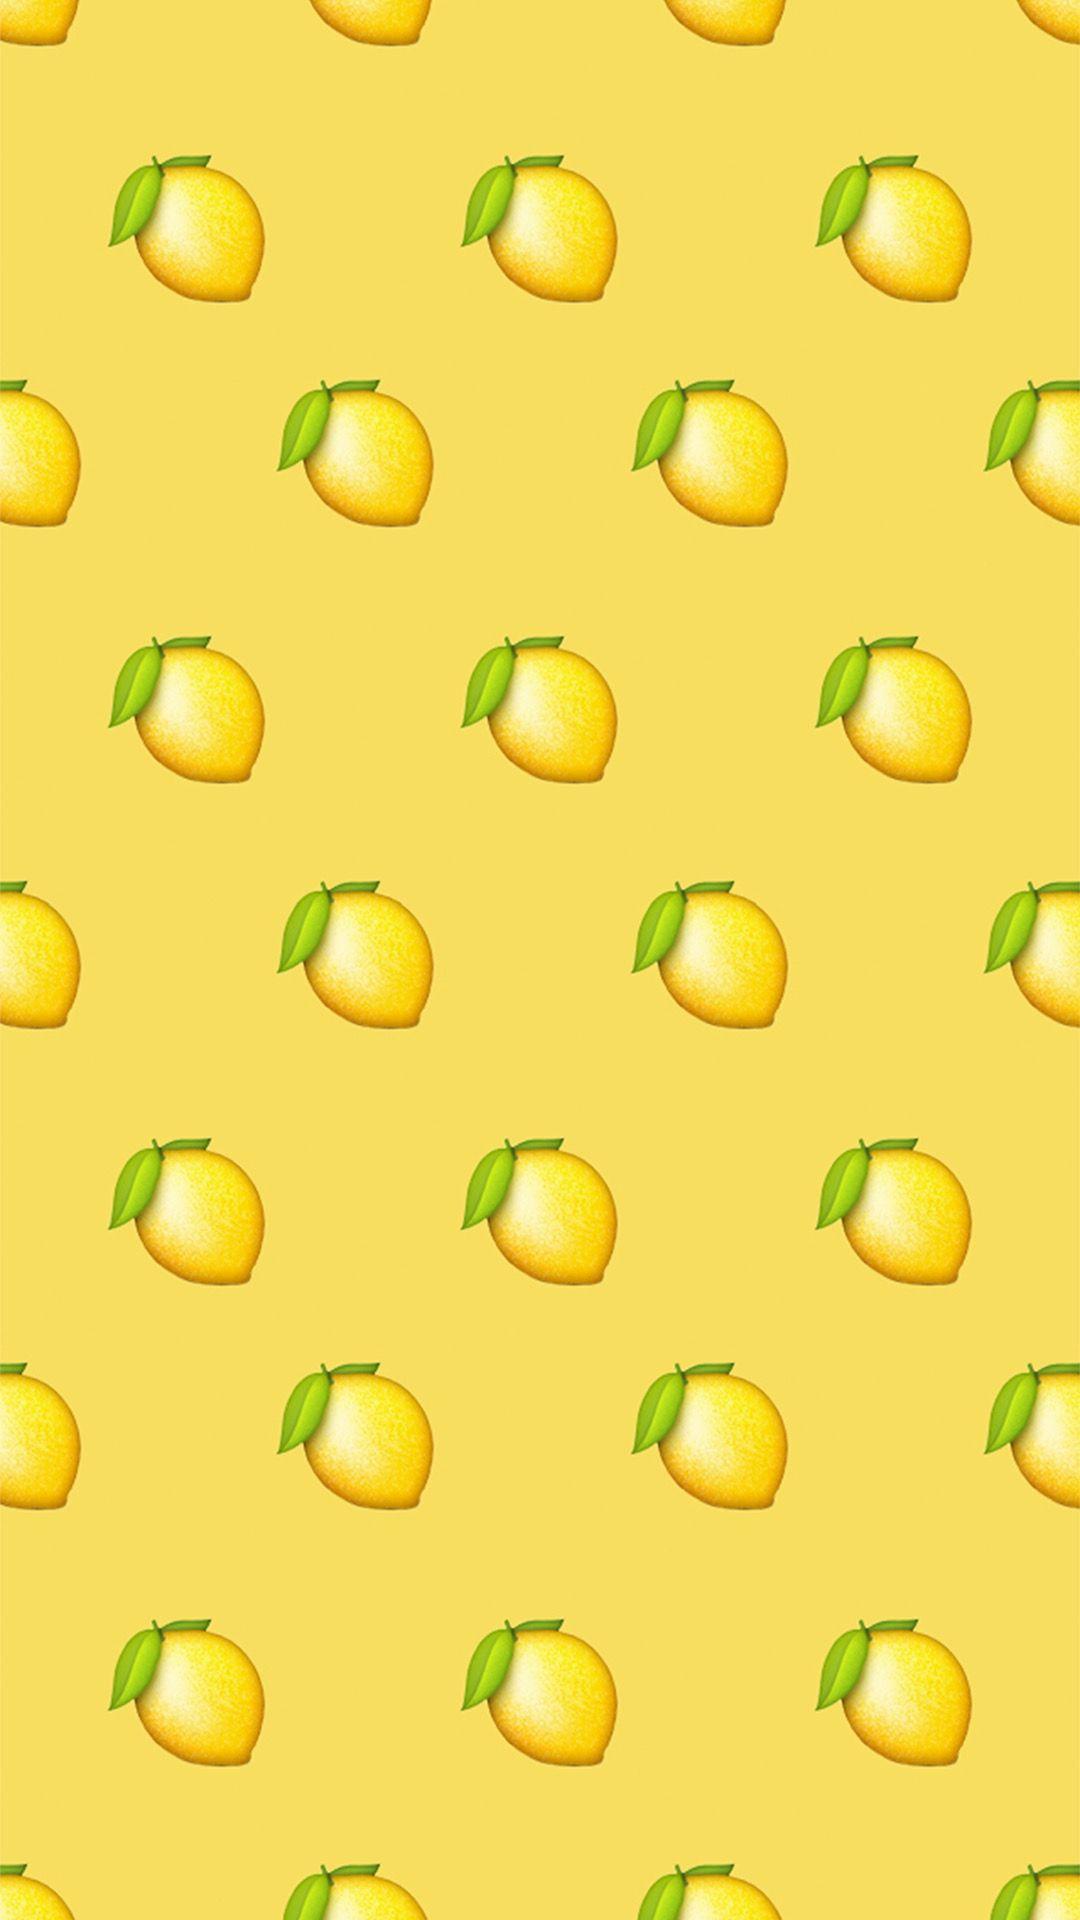 Cute emoji wallpaper image by ally🦋☁️ on Yellow | Emoji ...